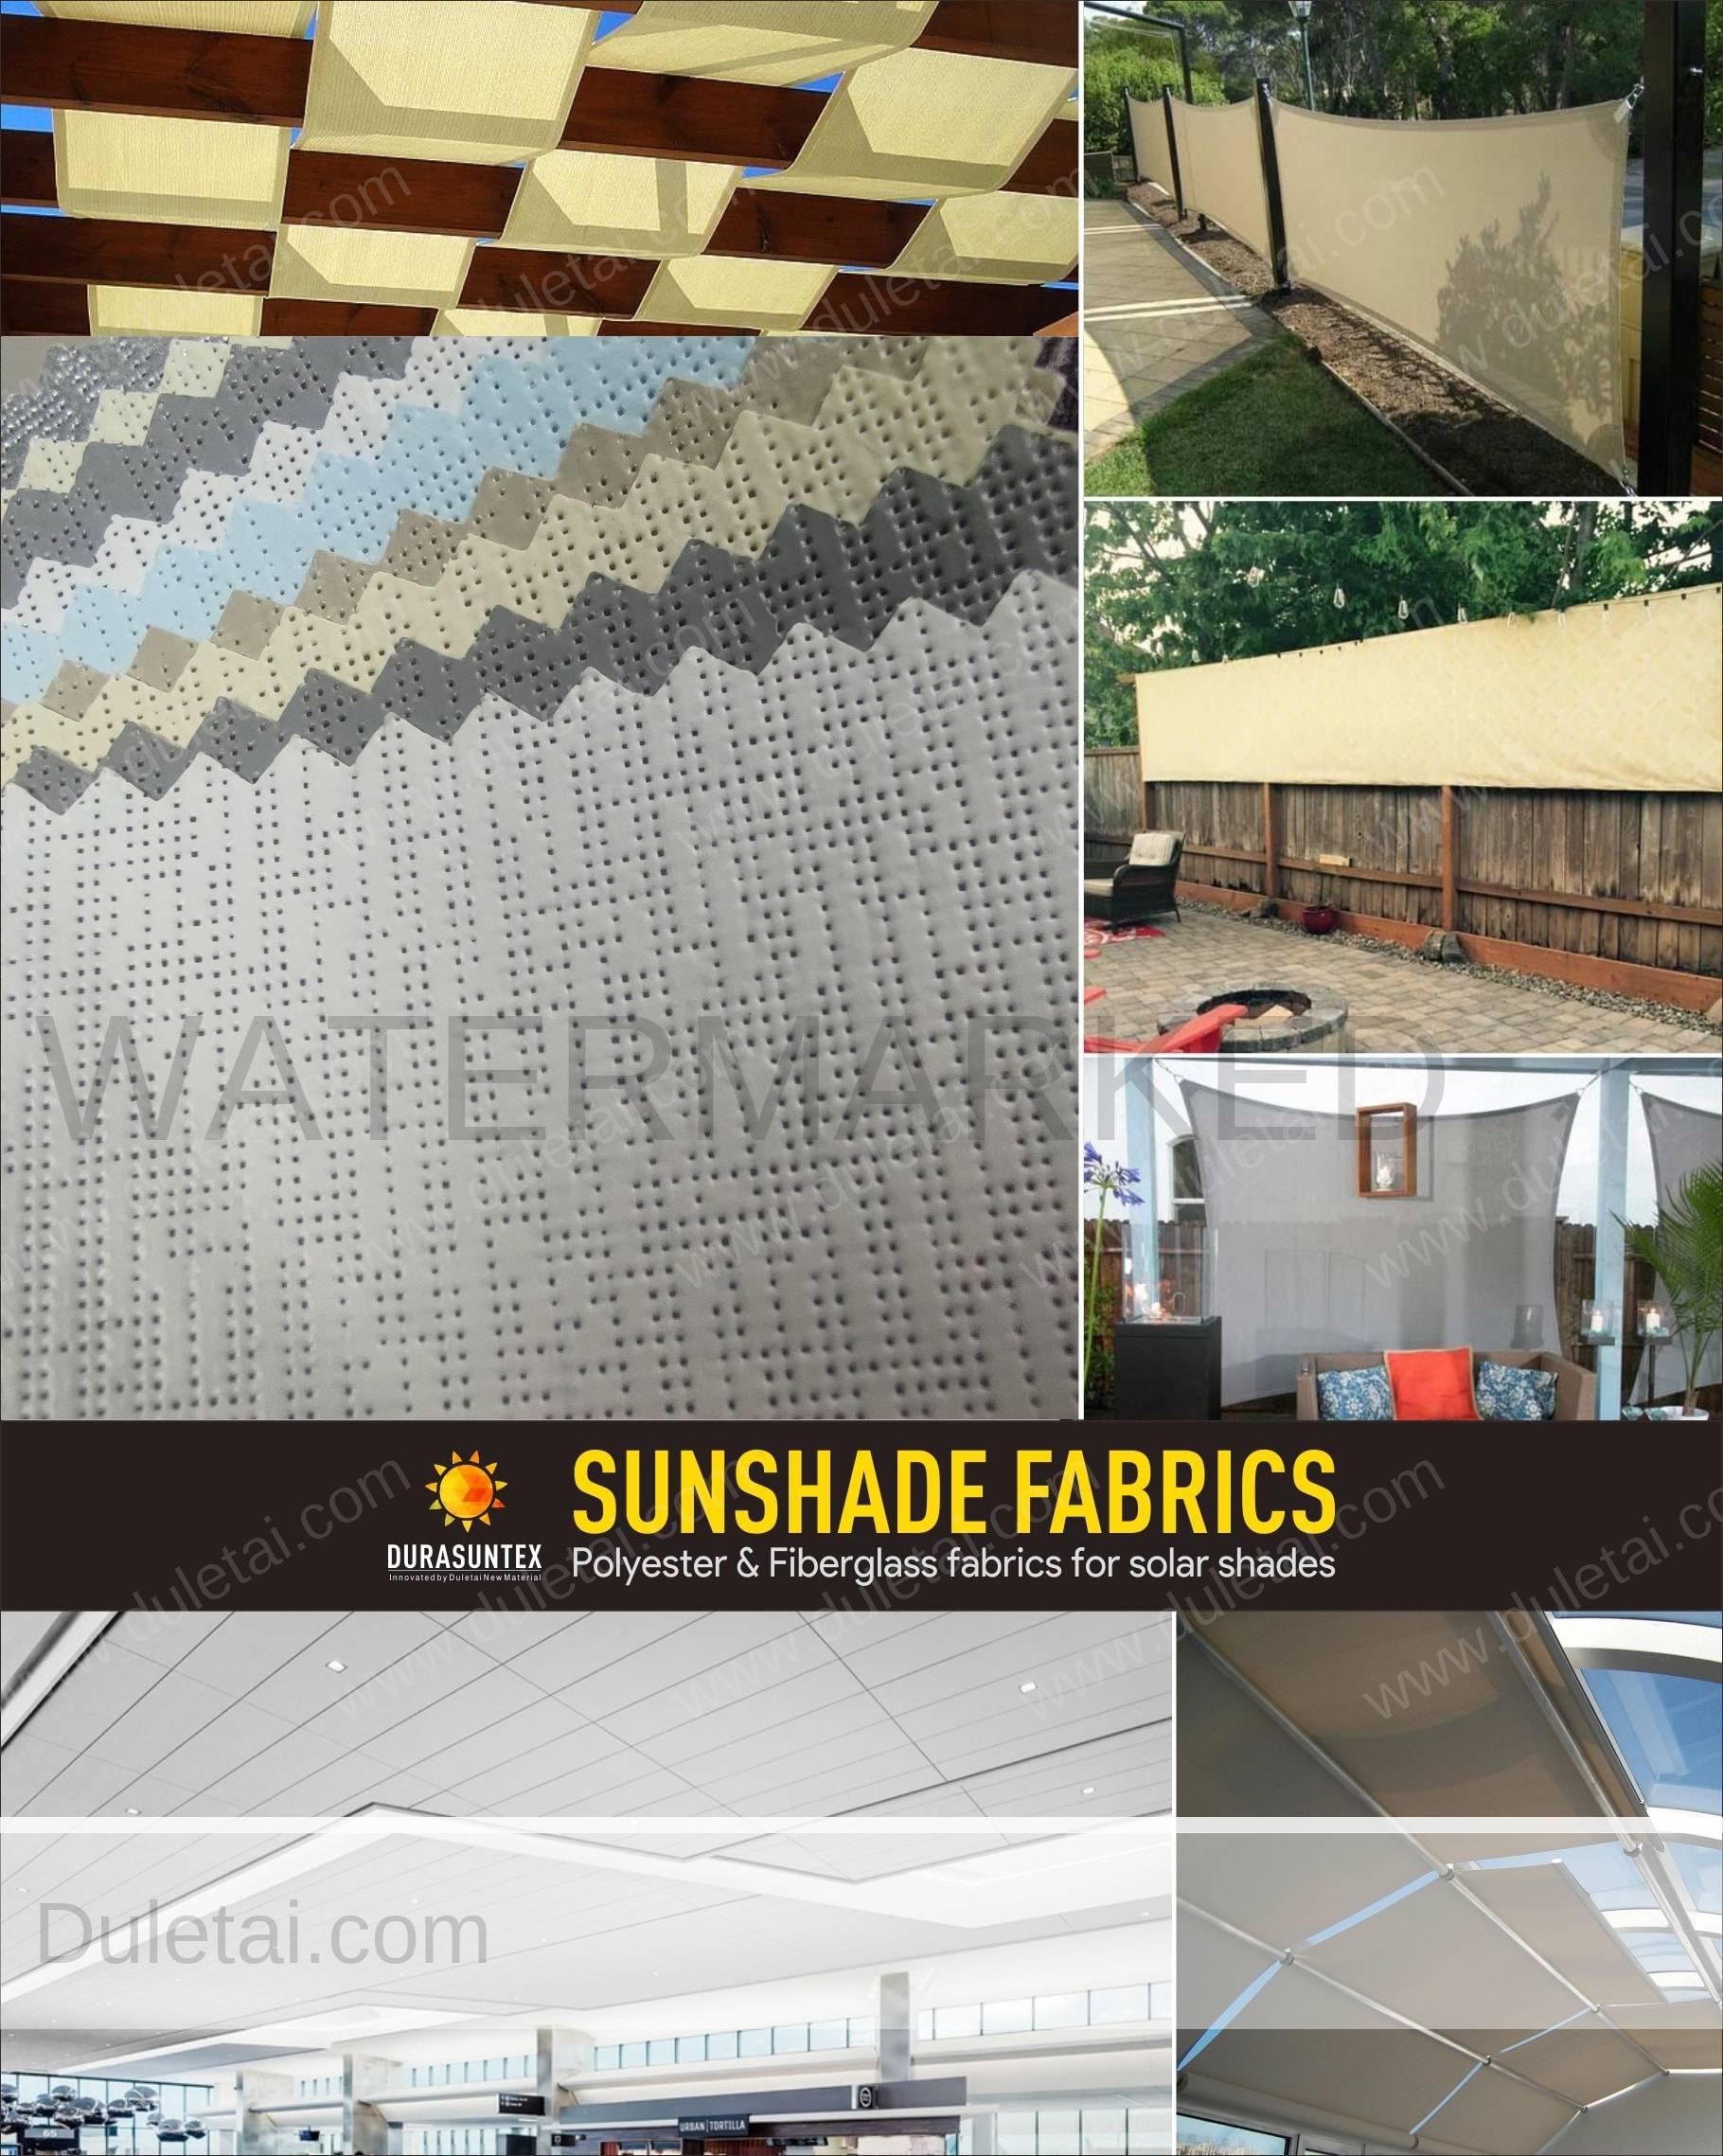 sunshade fabrics